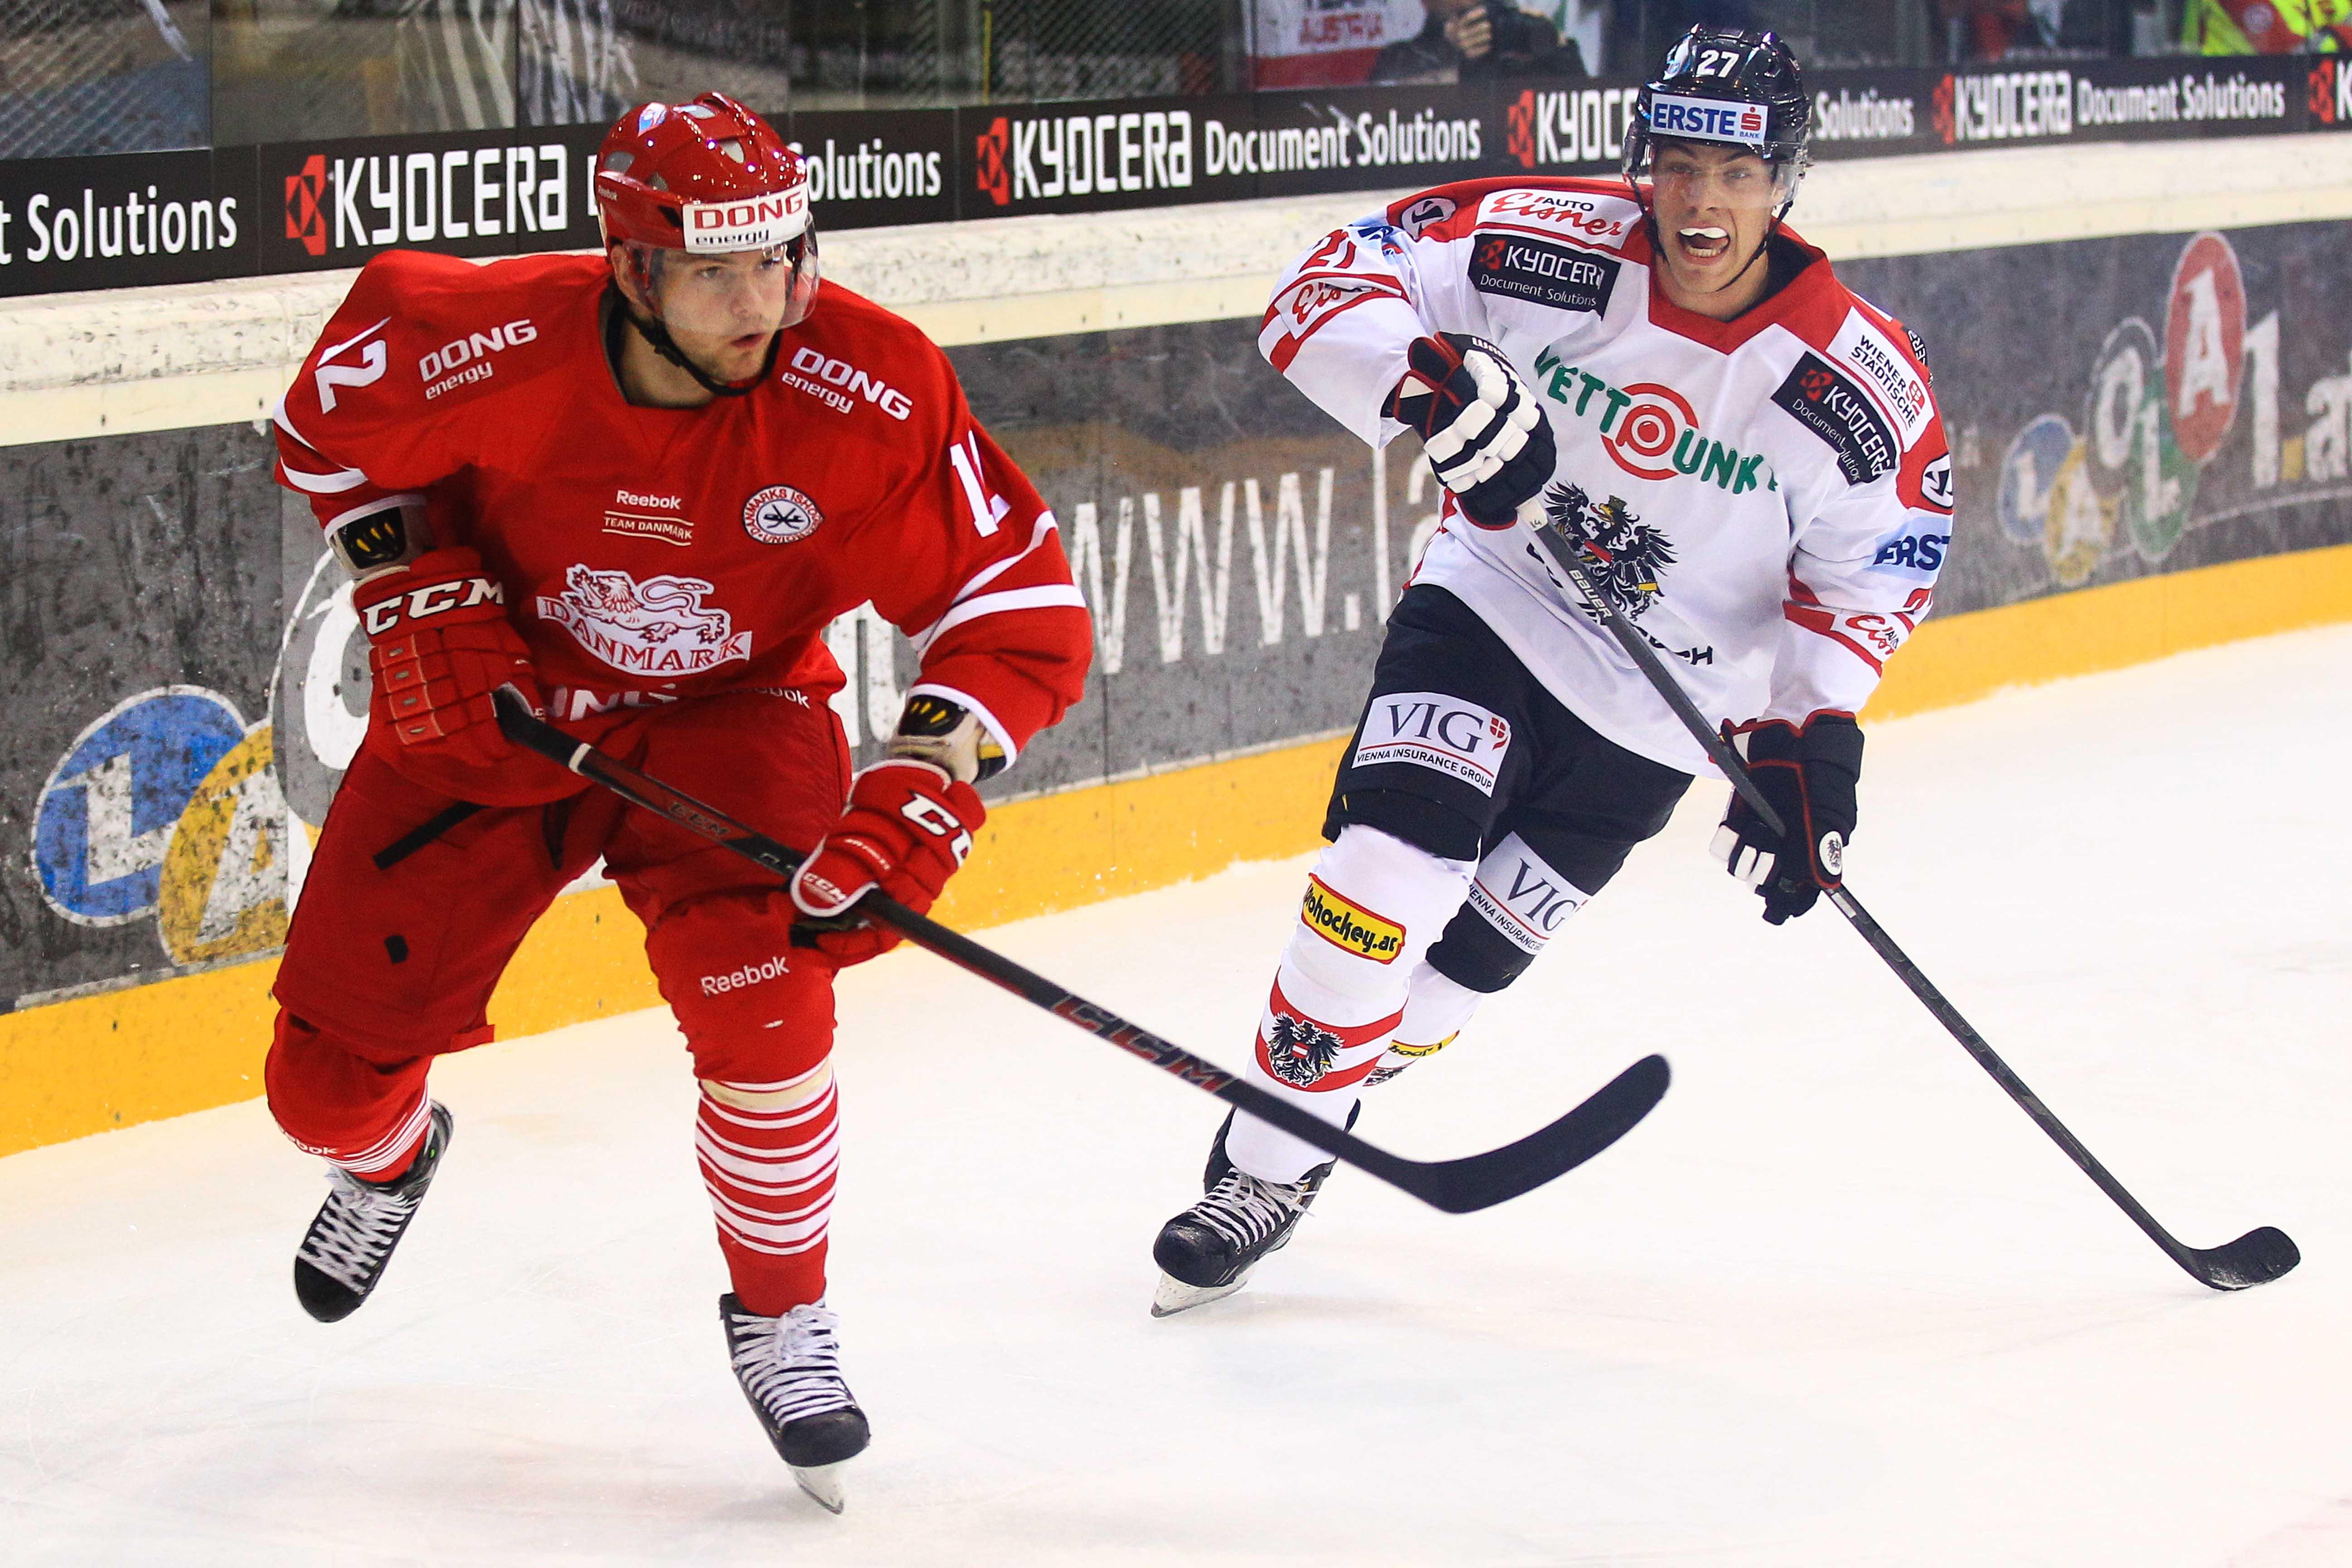 AUT, OeHV, Austria vs Daenemark